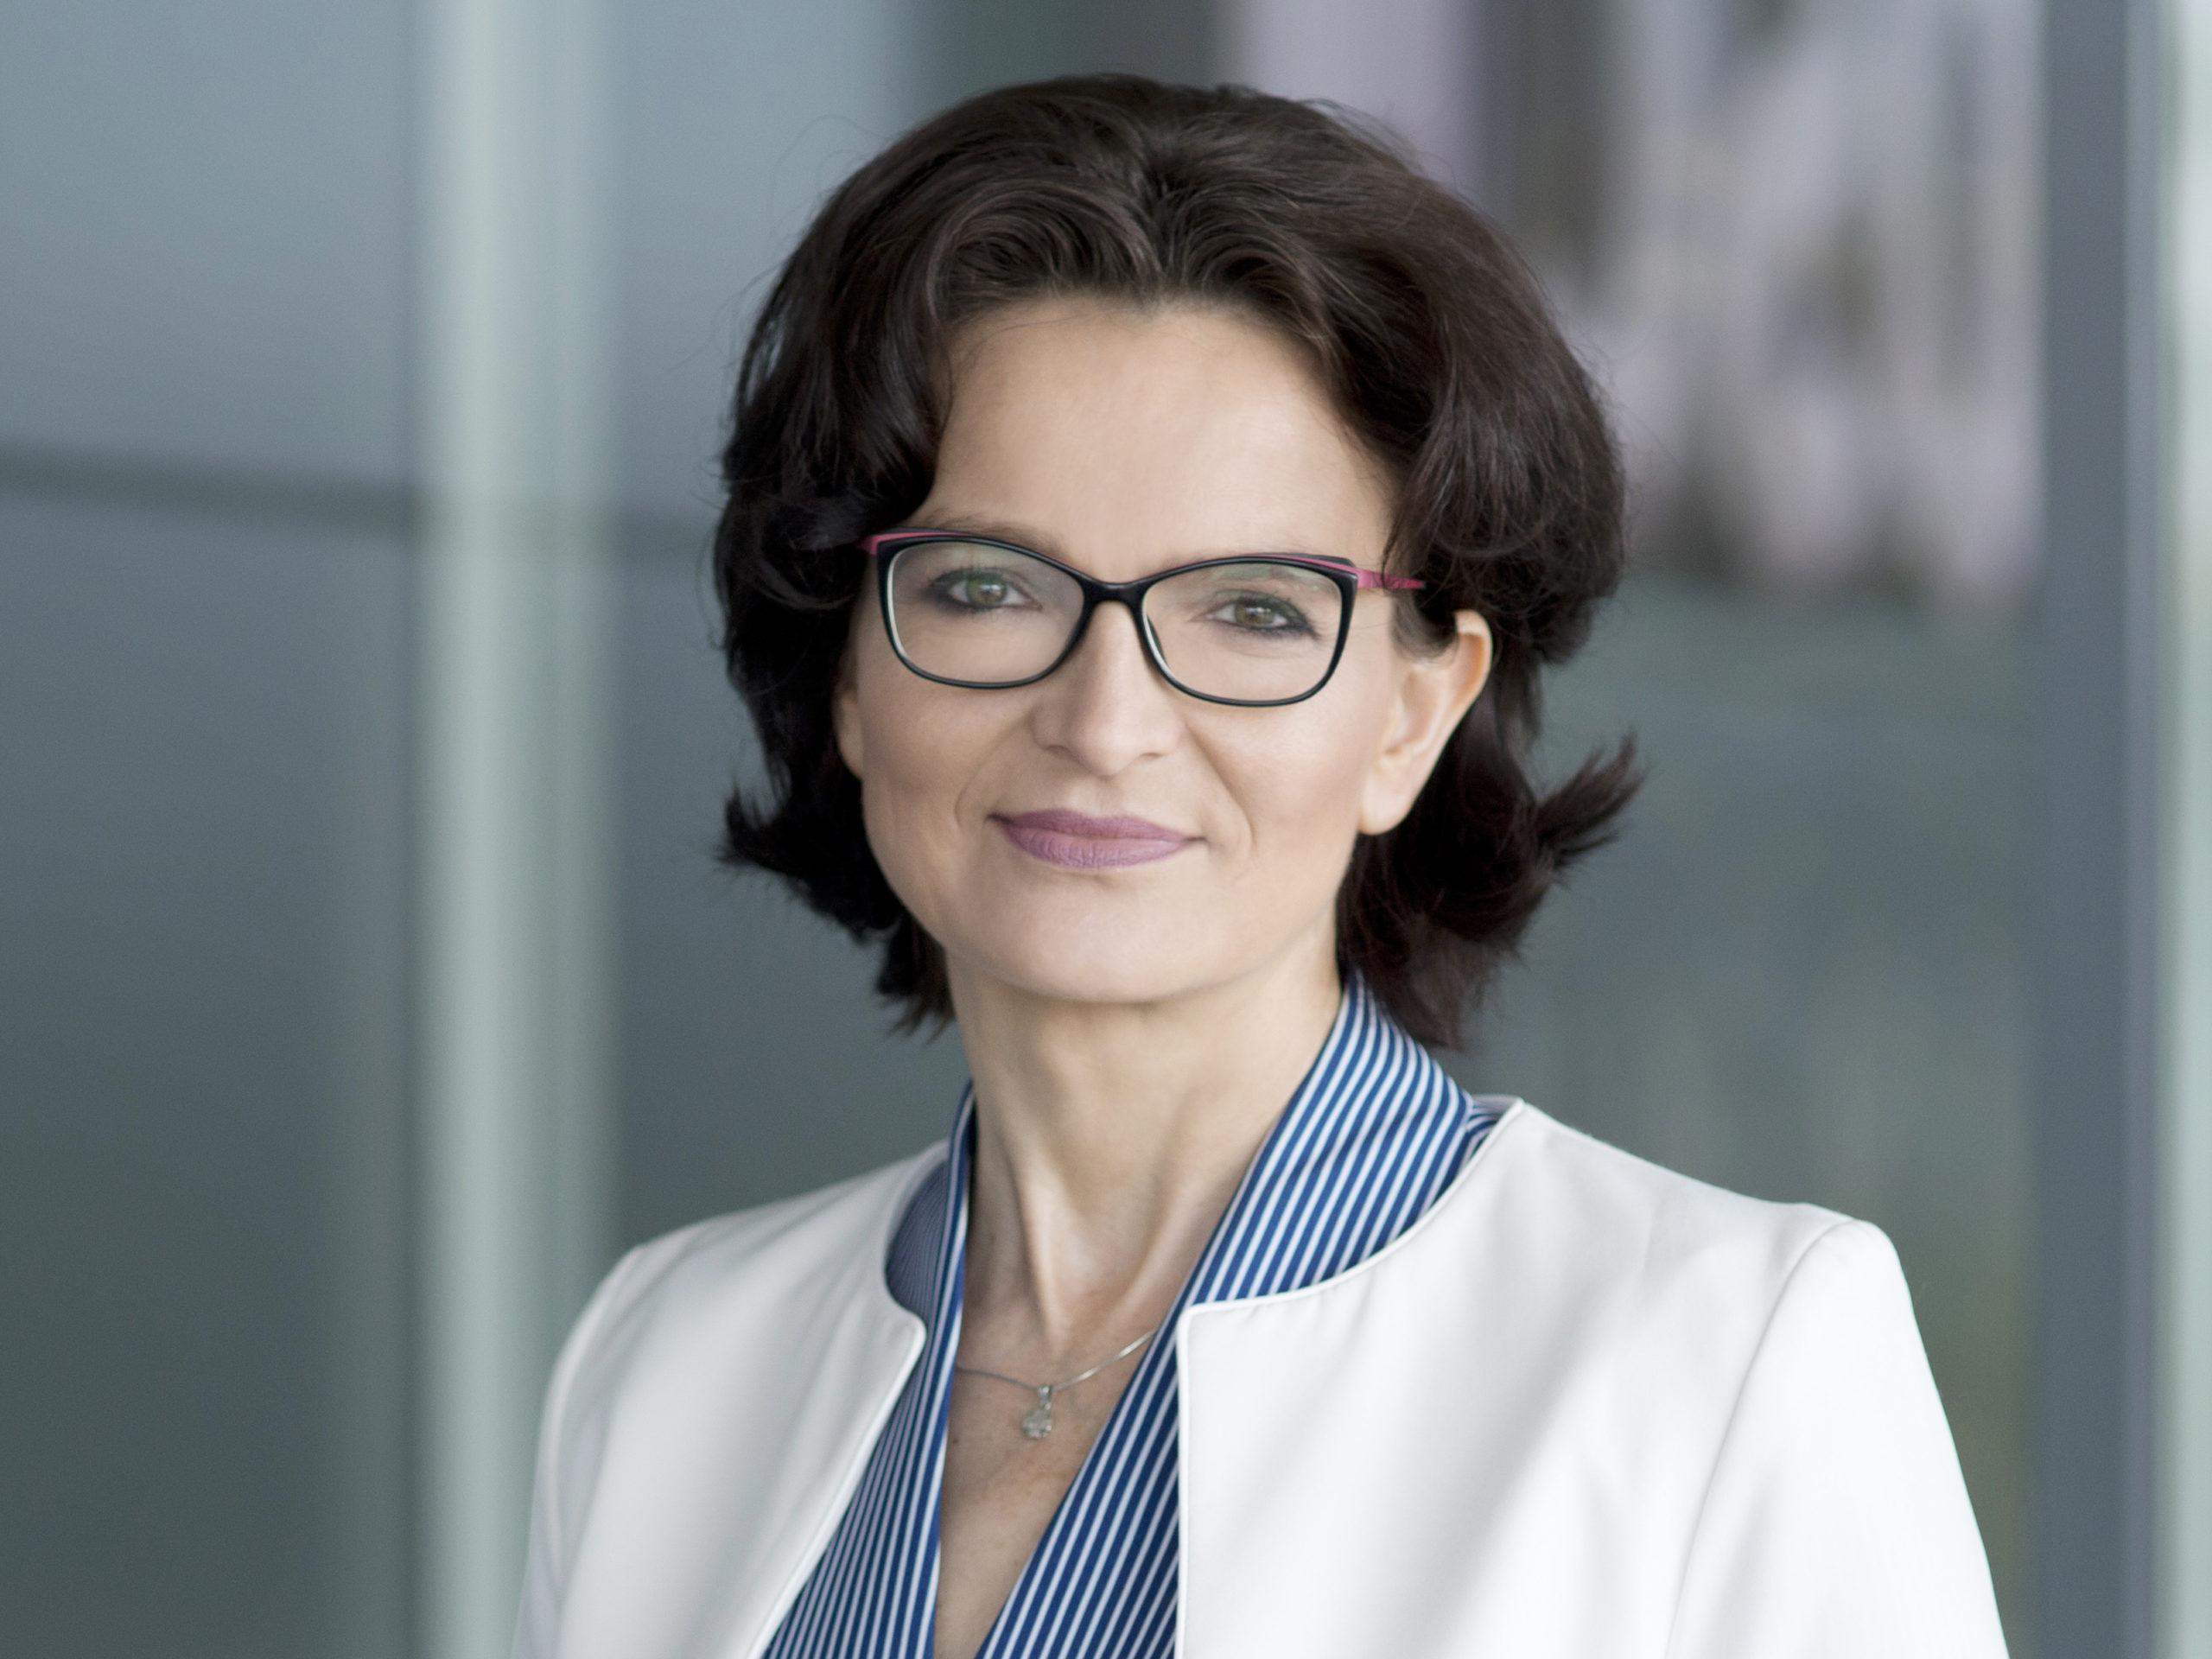 Izabela Pipka